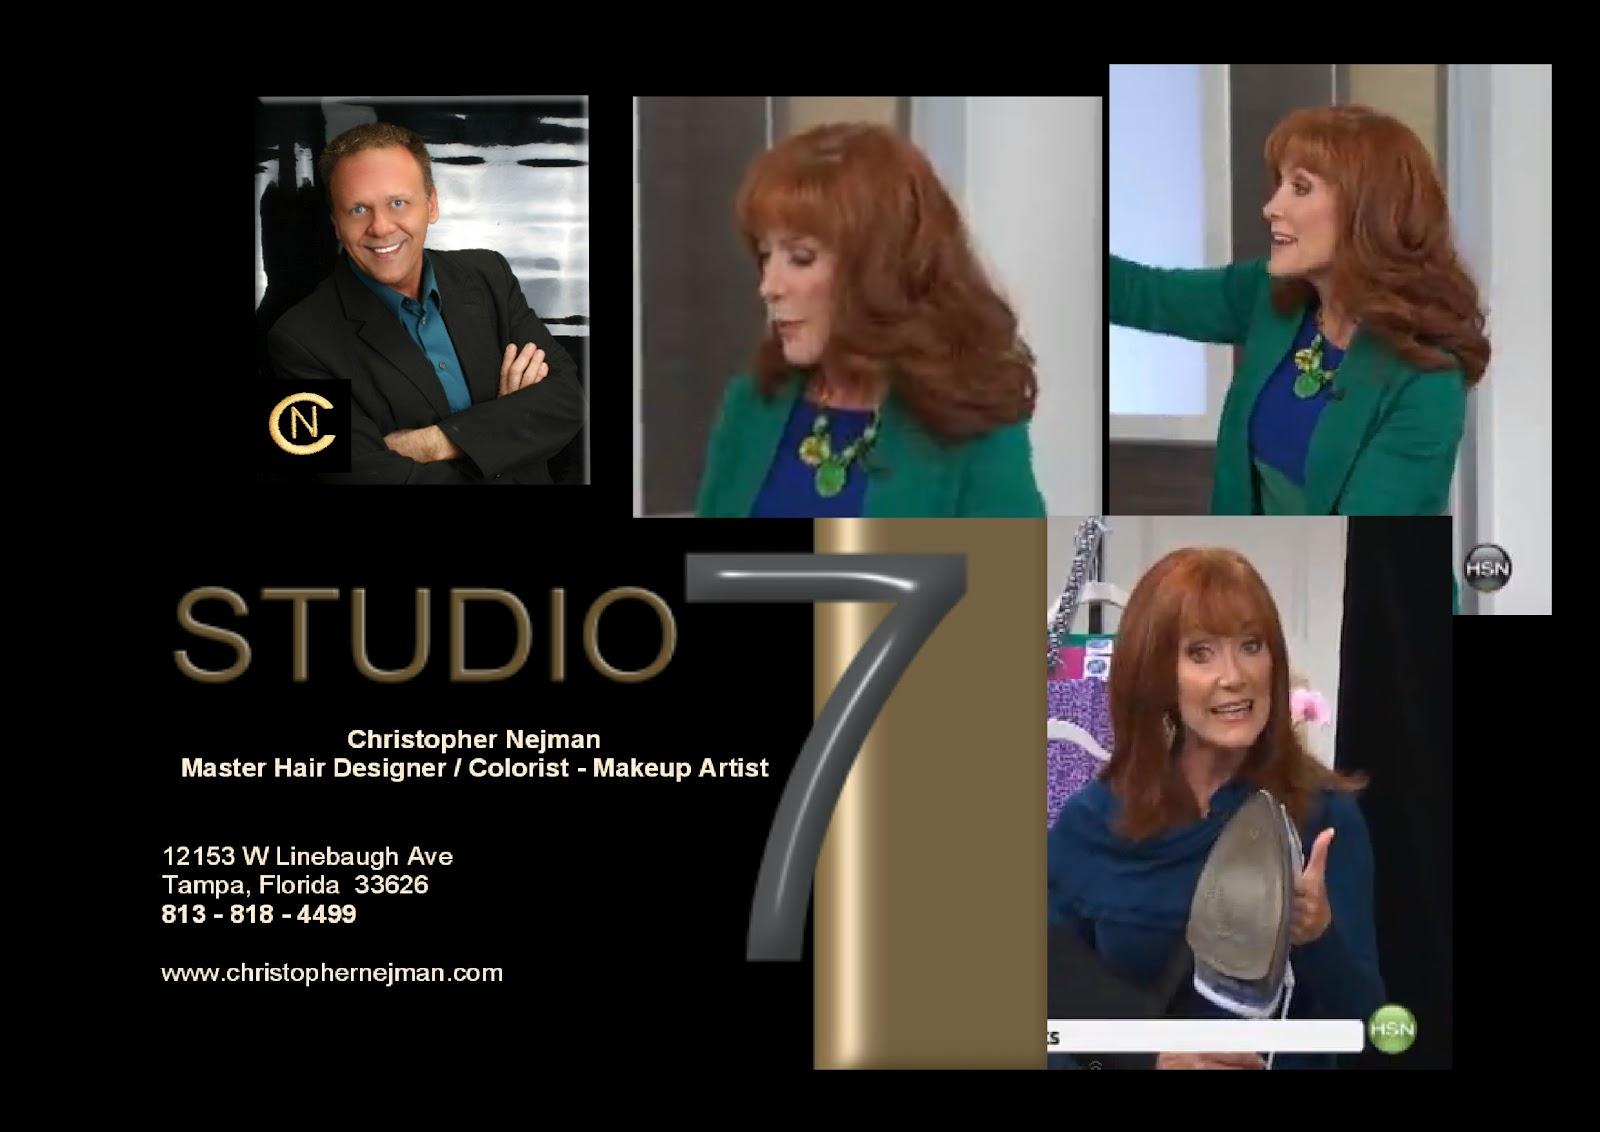 Christophernejman christopher nejman studio 7 hair salon - Christophe hair salon ...